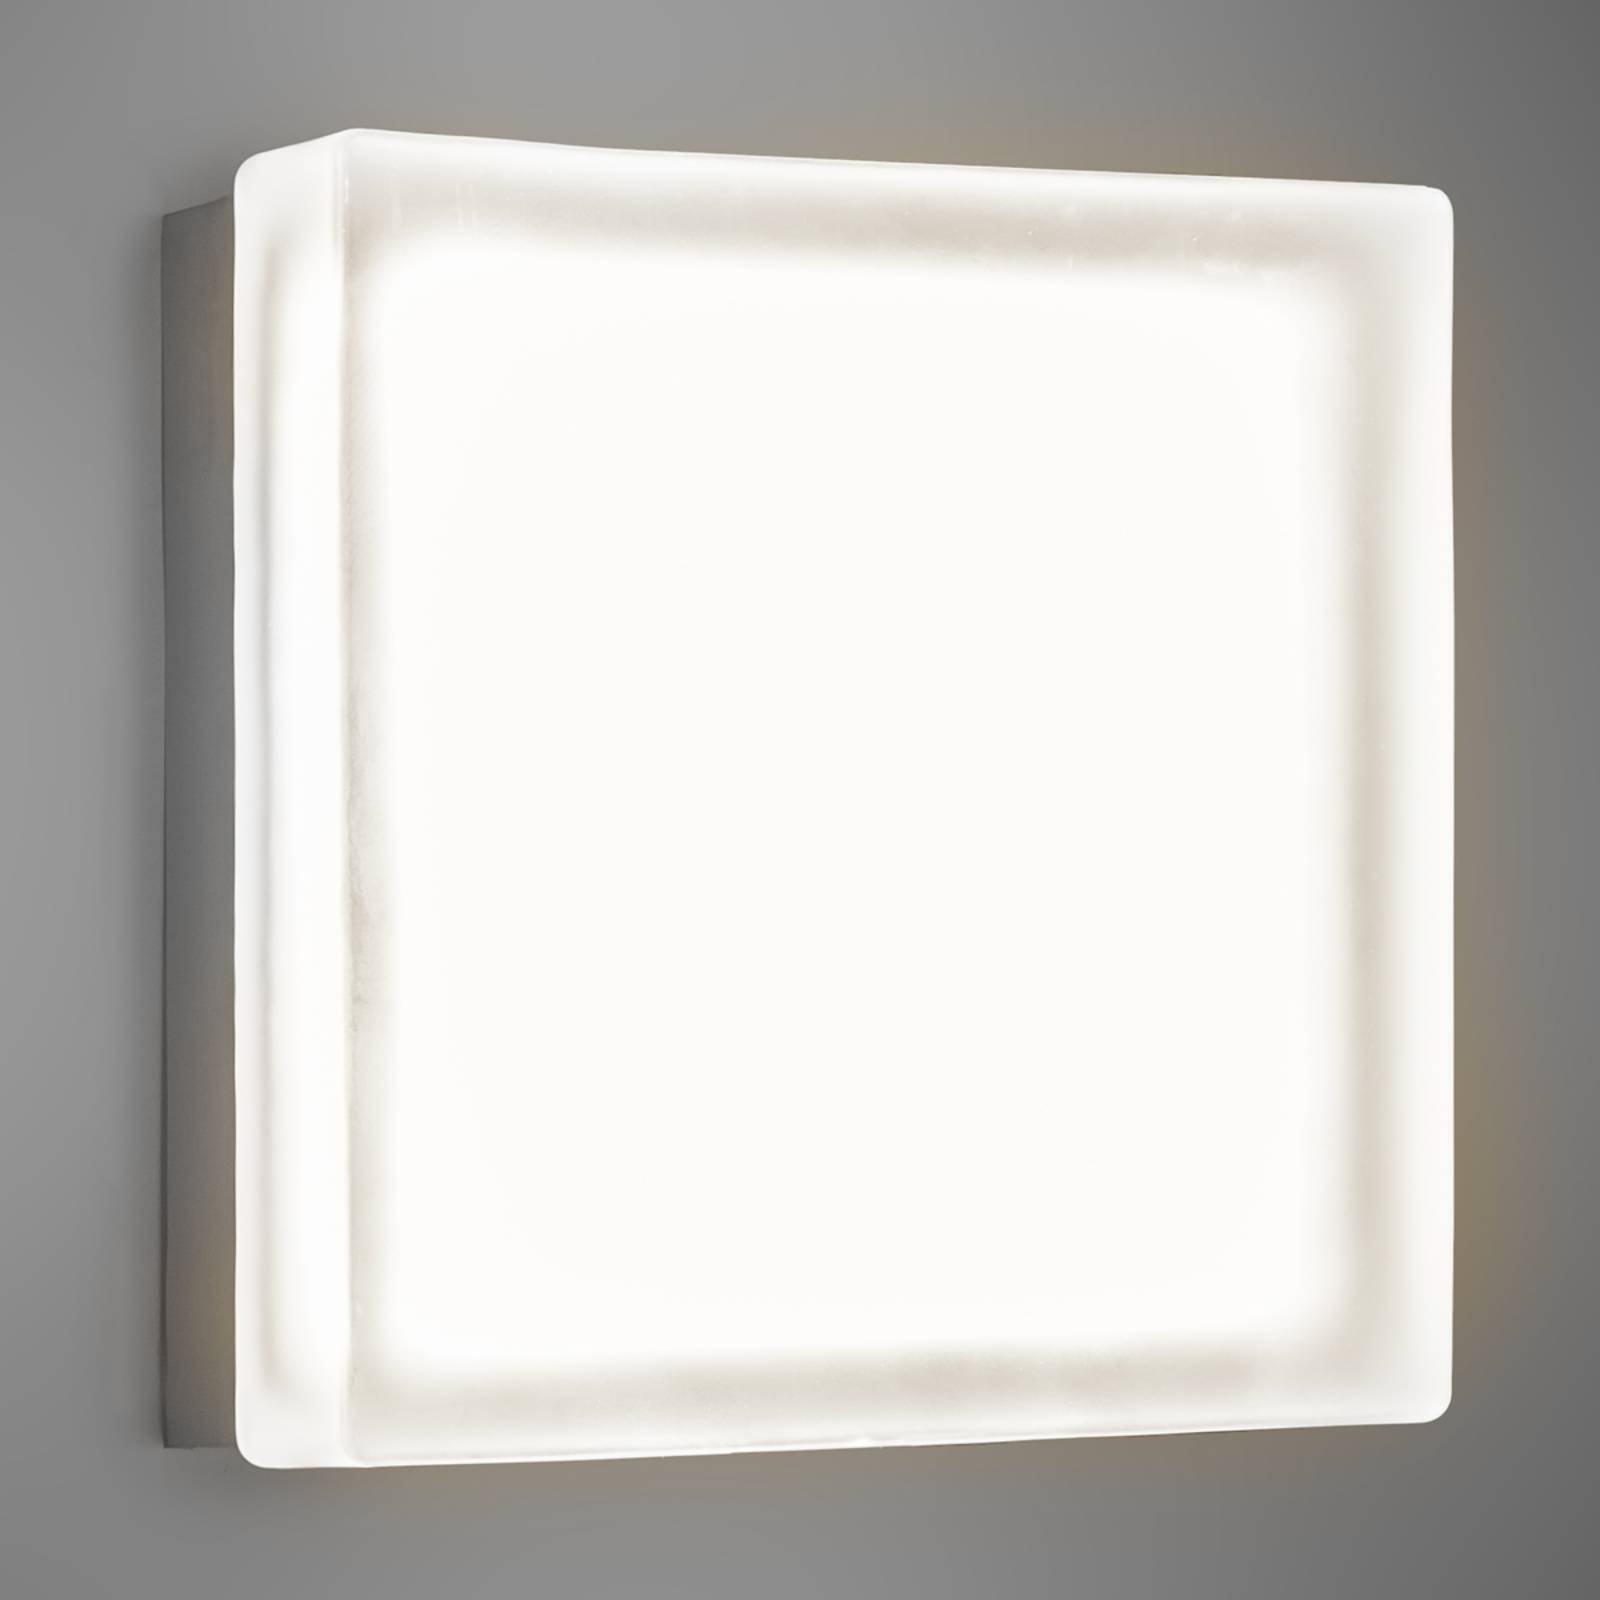 Kvadratisk LED-vegglampe Briq 02 varmhvit